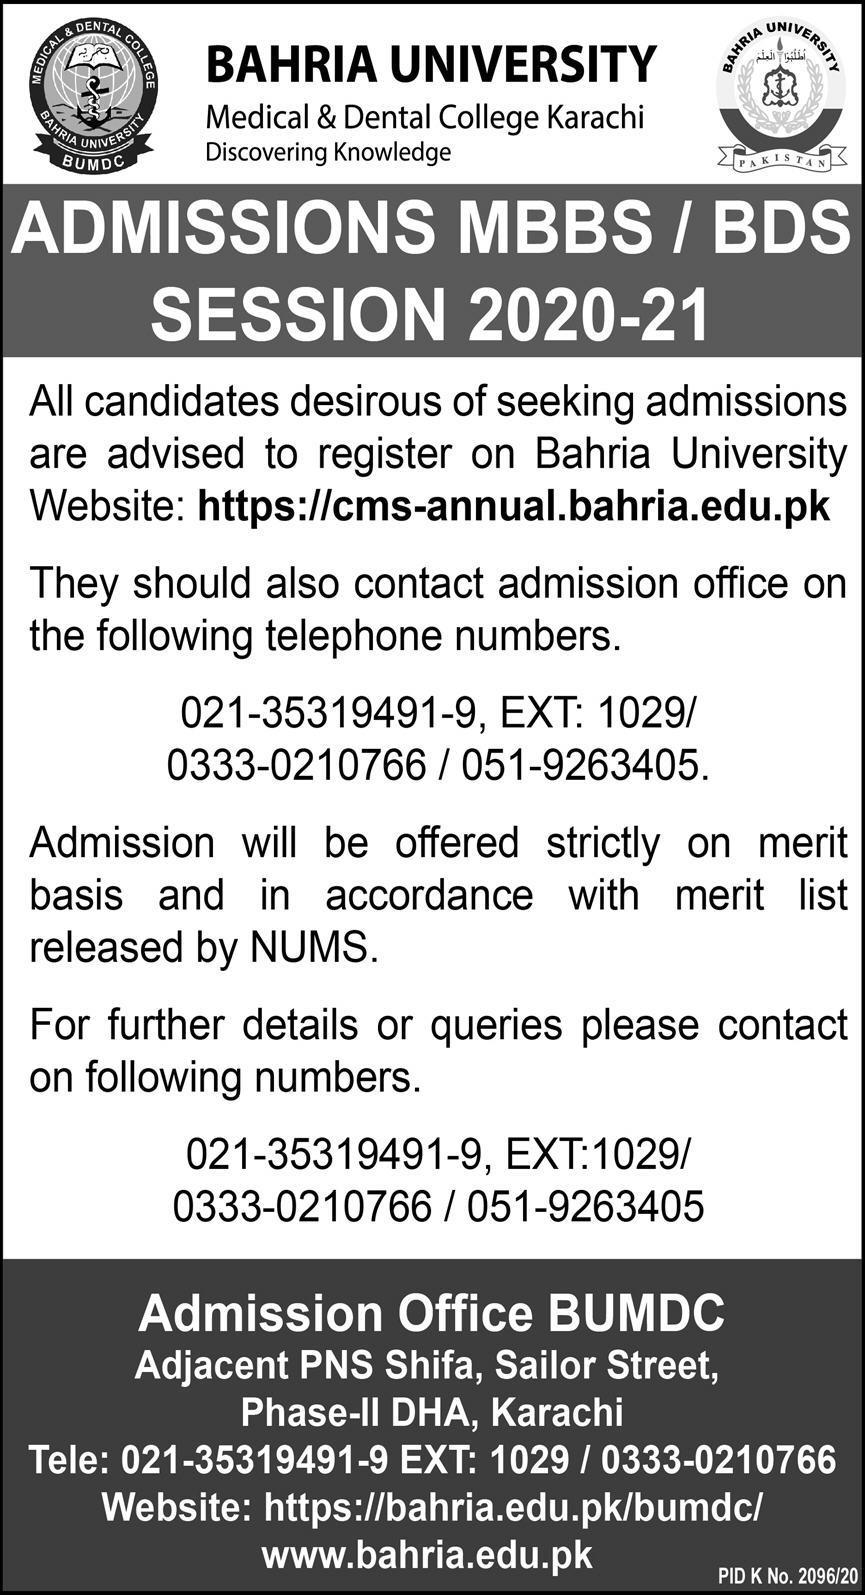 BUMDC Karachi MBBS & BDS Admission 2020, Form Entry Test